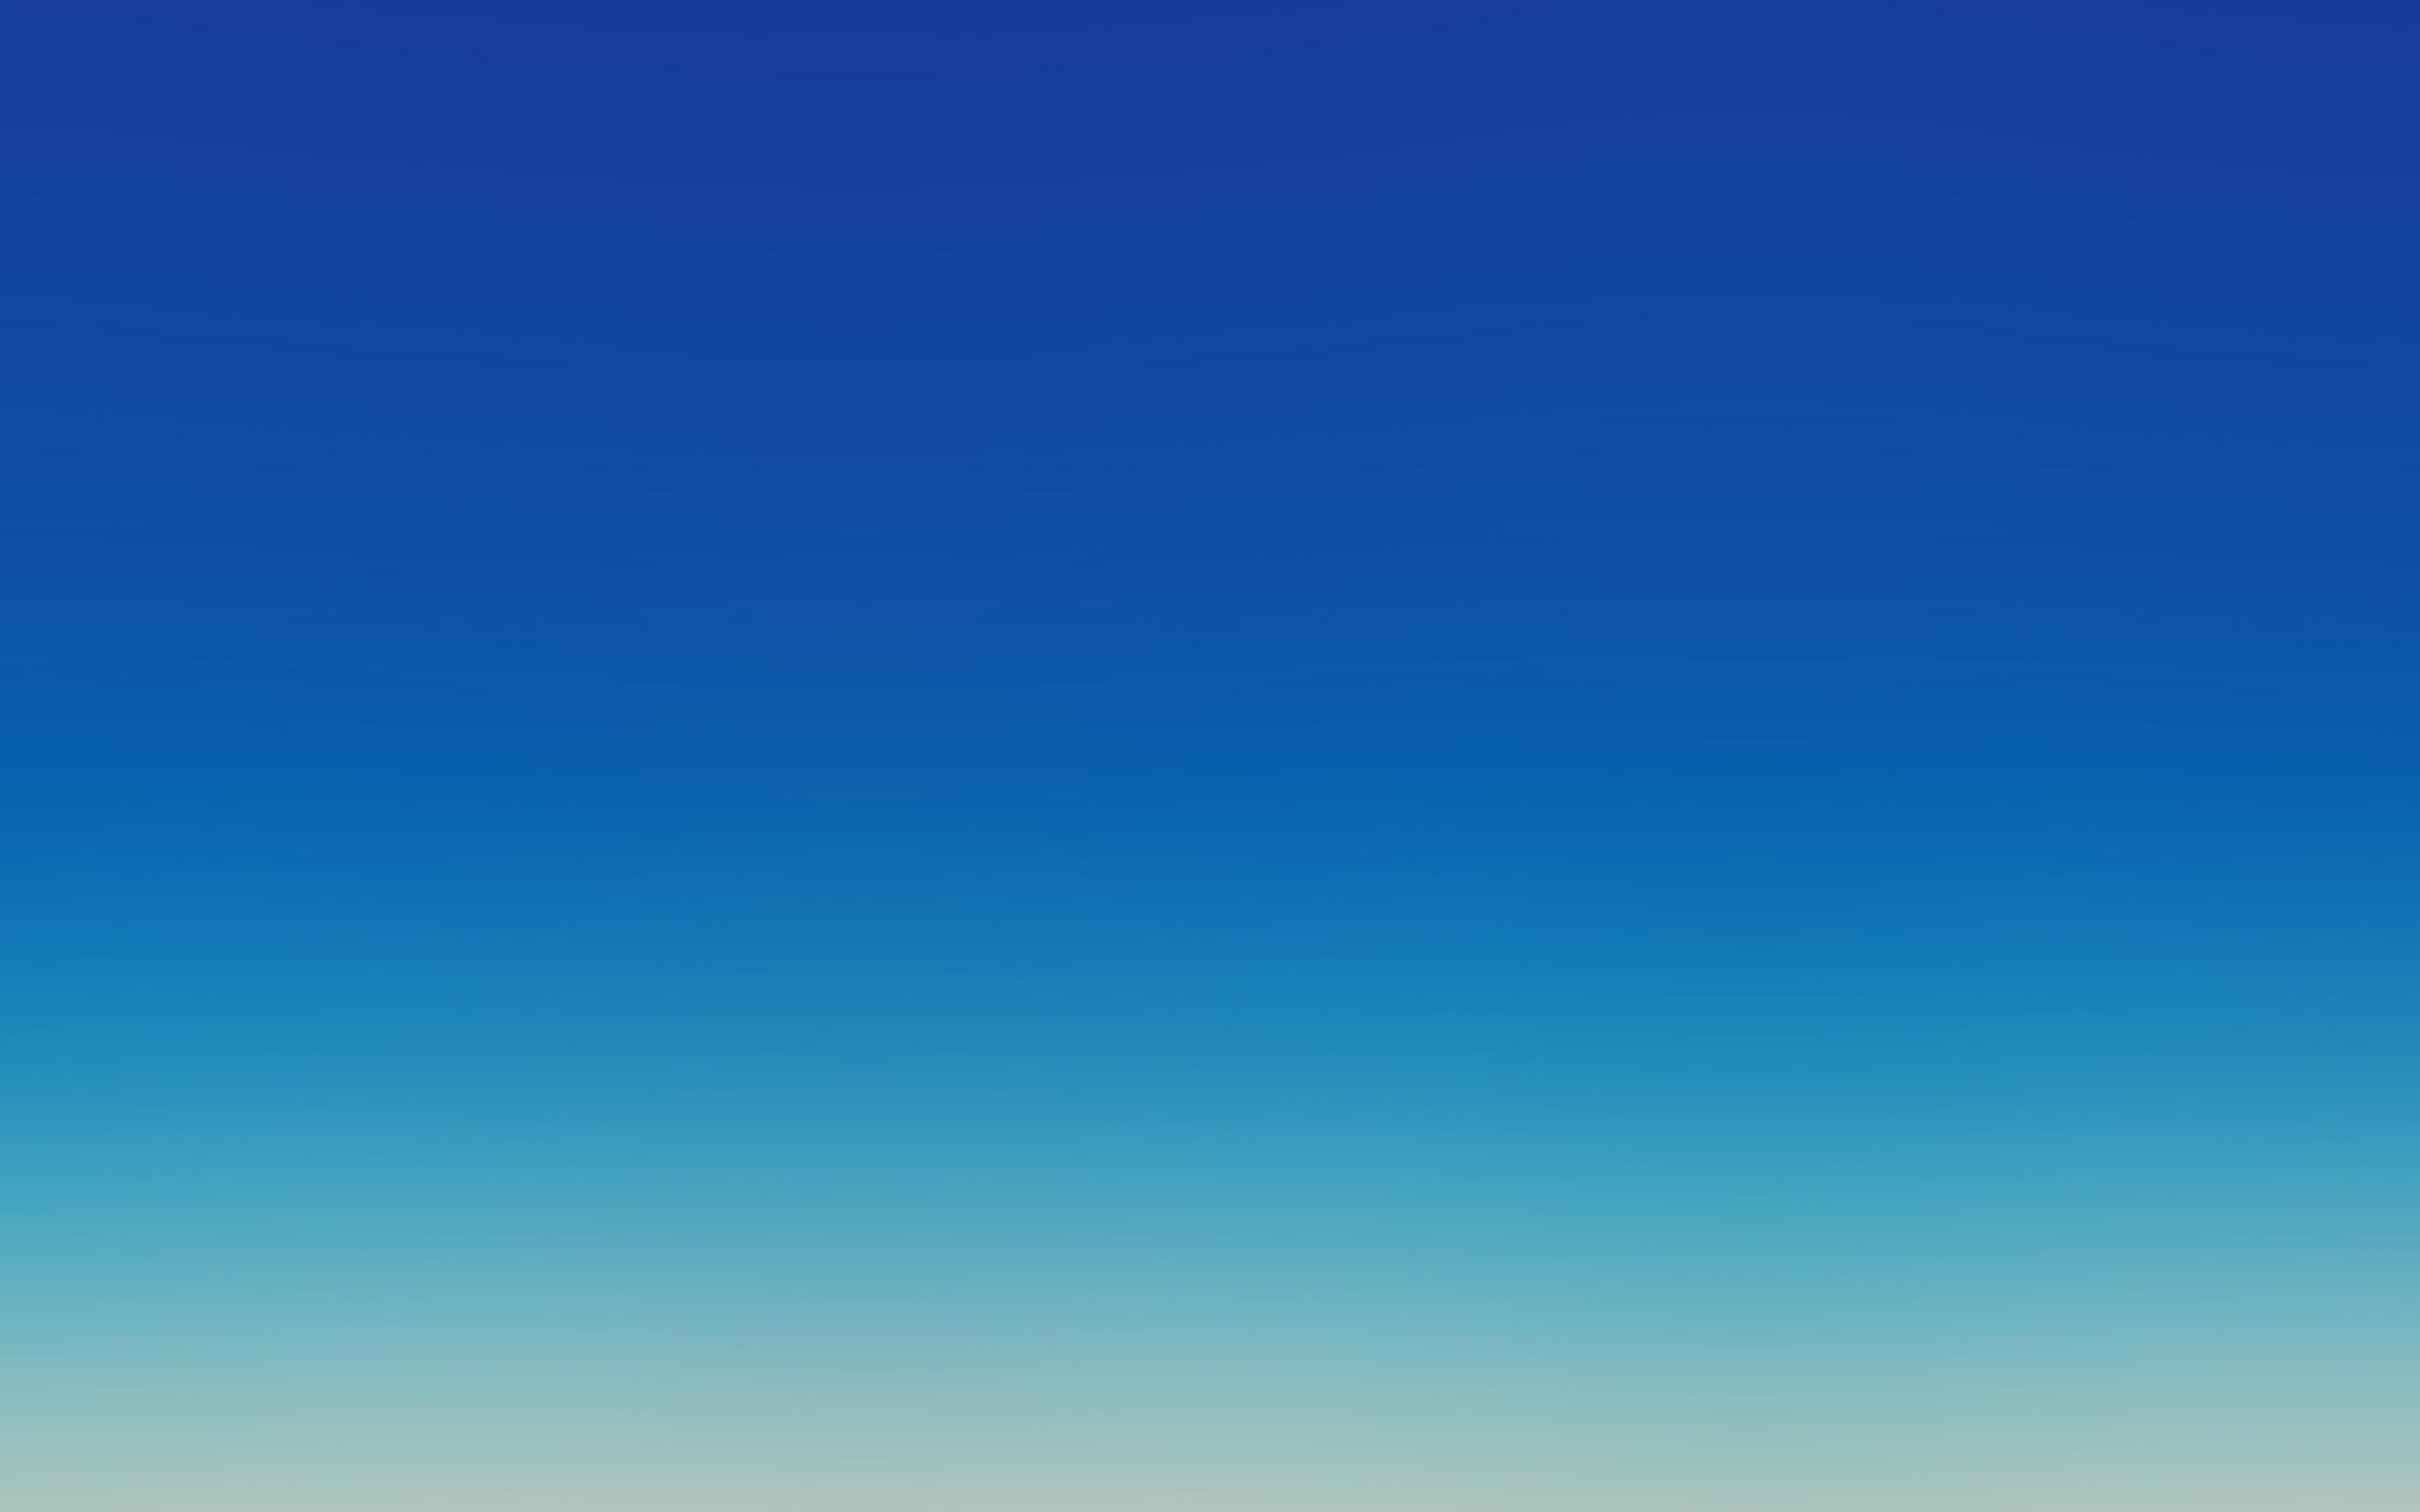 Wallpaper For Desktop Laptop Sb10 Wallpaper Blue Sky Blue Blur